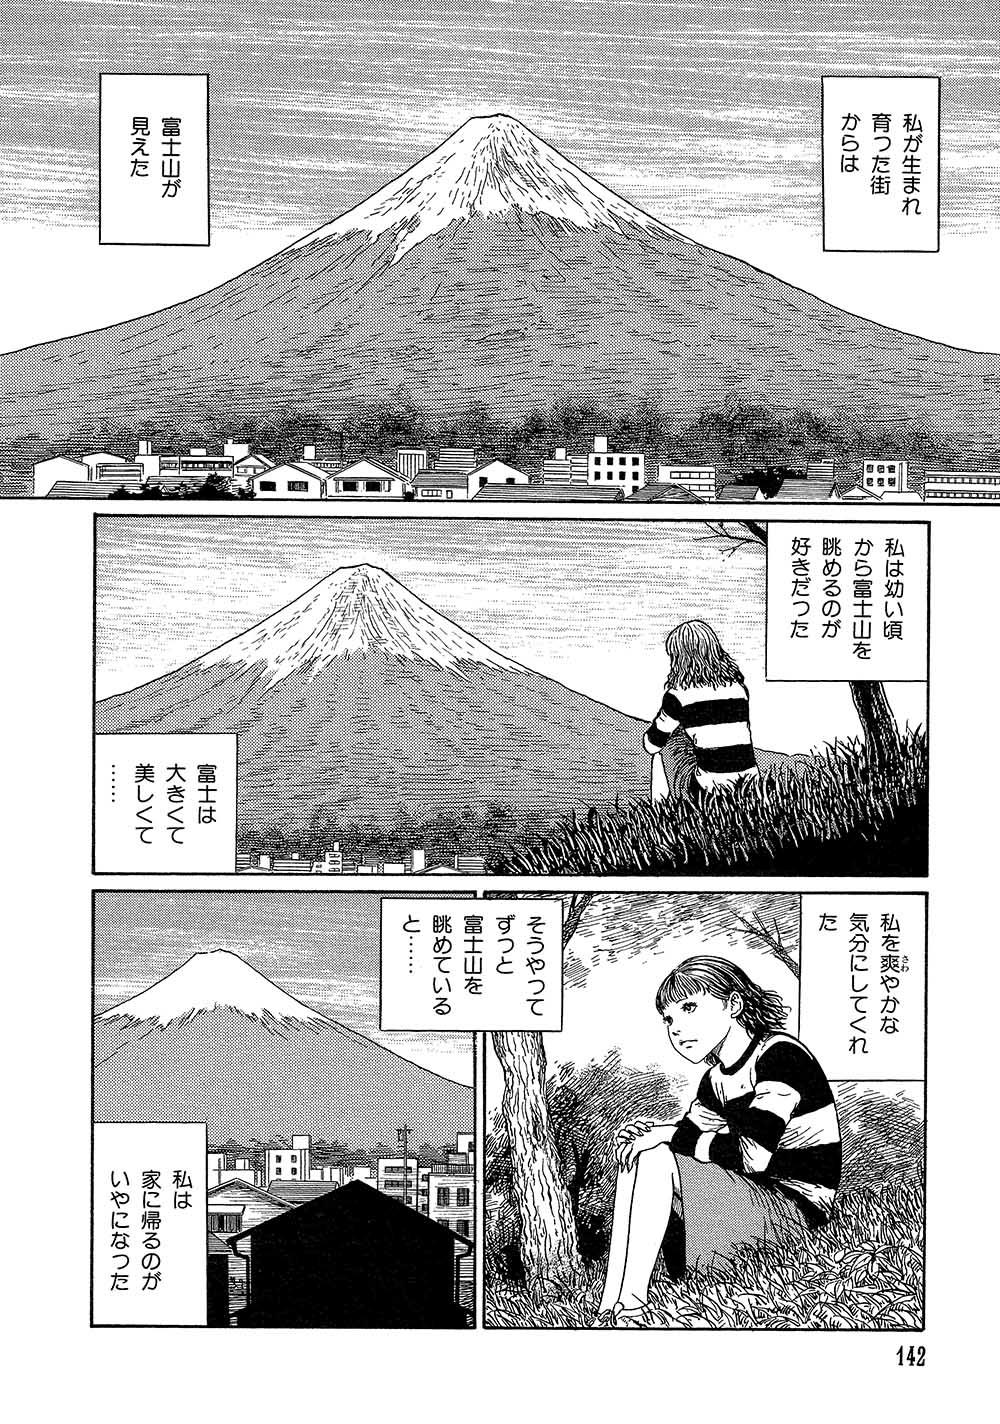 yami_0001_0142.jpg